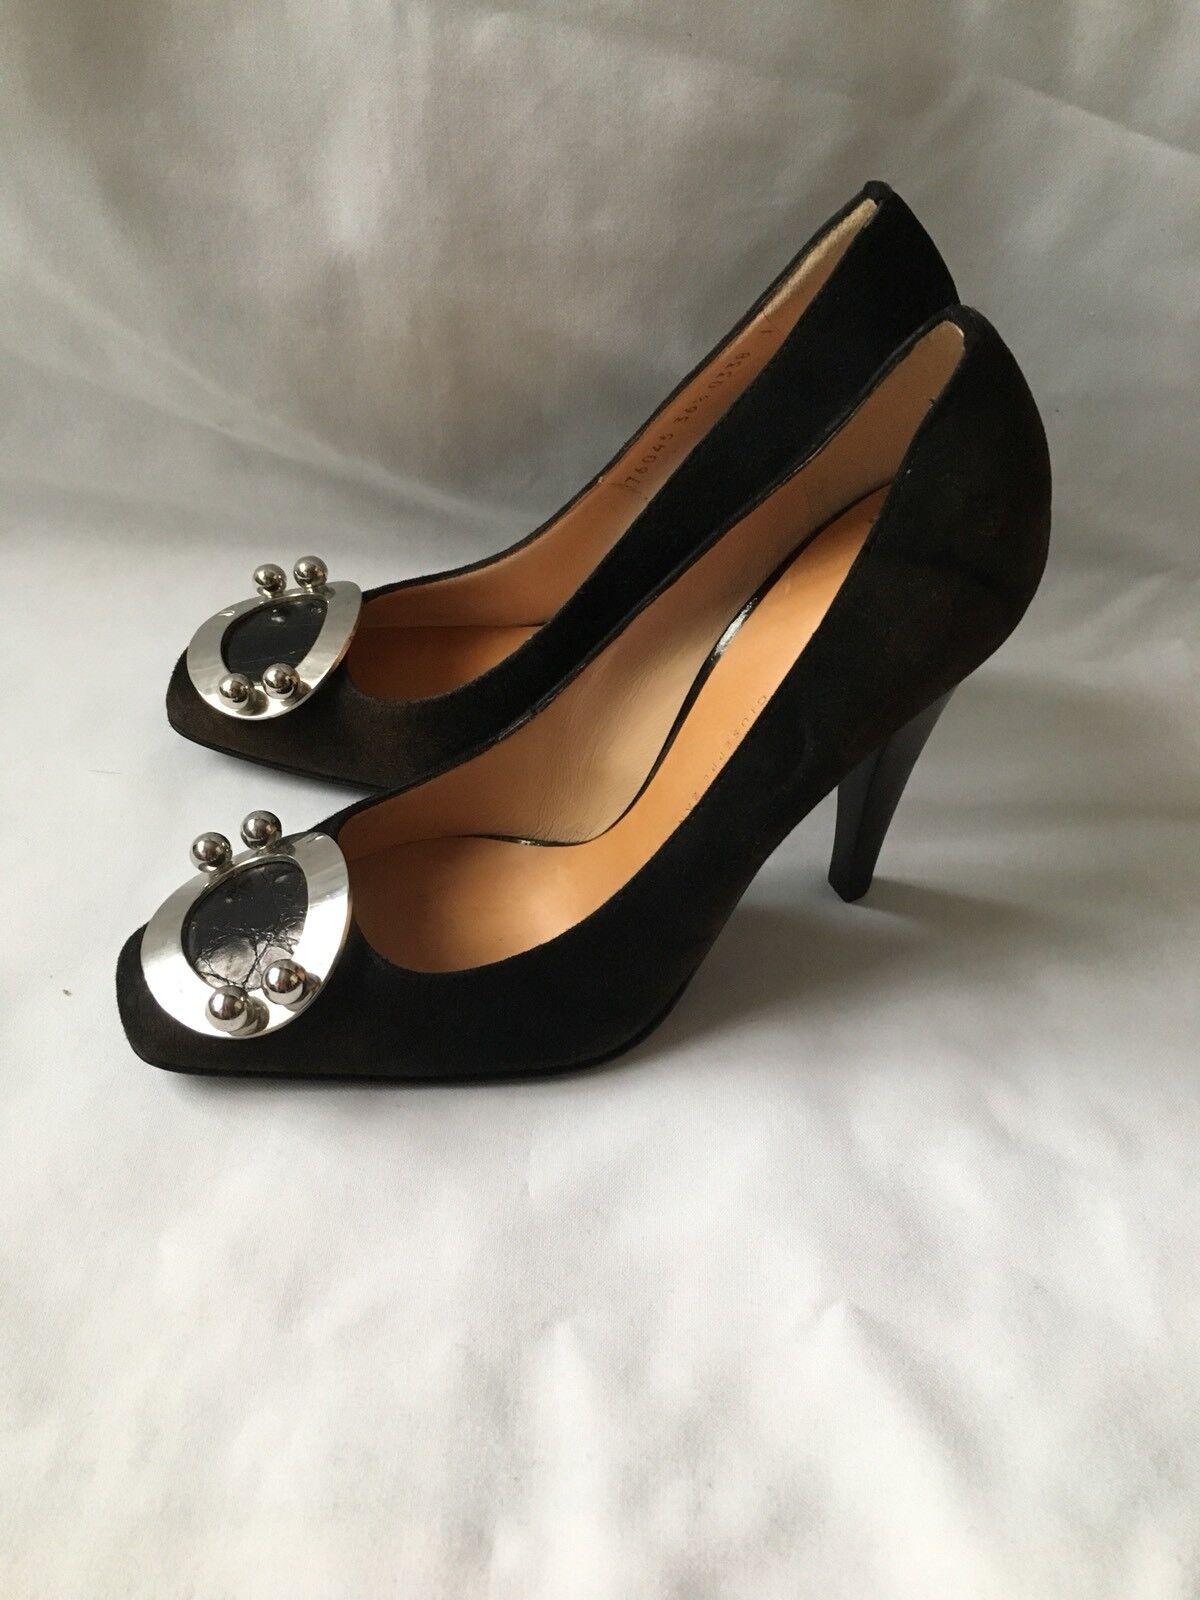 Giuseppe Zanotti Vintage Vintage Vintage Negro Cuero de gamuza tacón Zapatos (Talla 36.5  Precio por piso